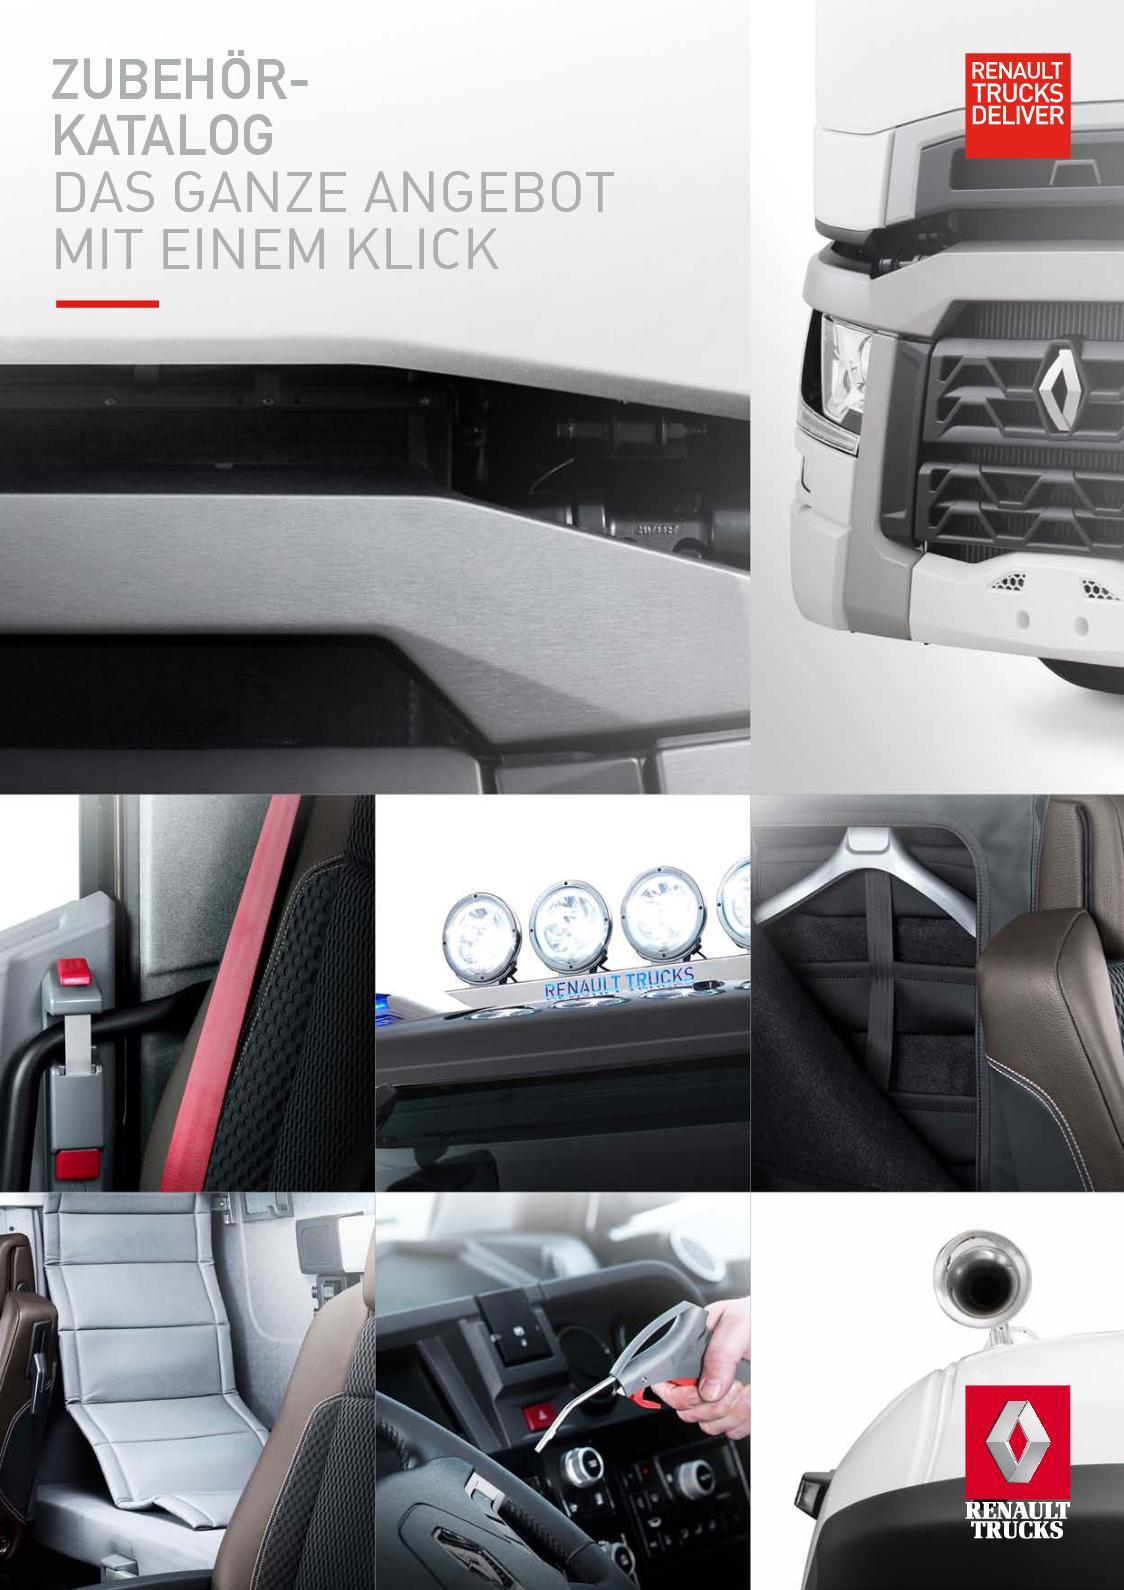 calam o acc zubeh r katalog renault trucks de. Black Bedroom Furniture Sets. Home Design Ideas